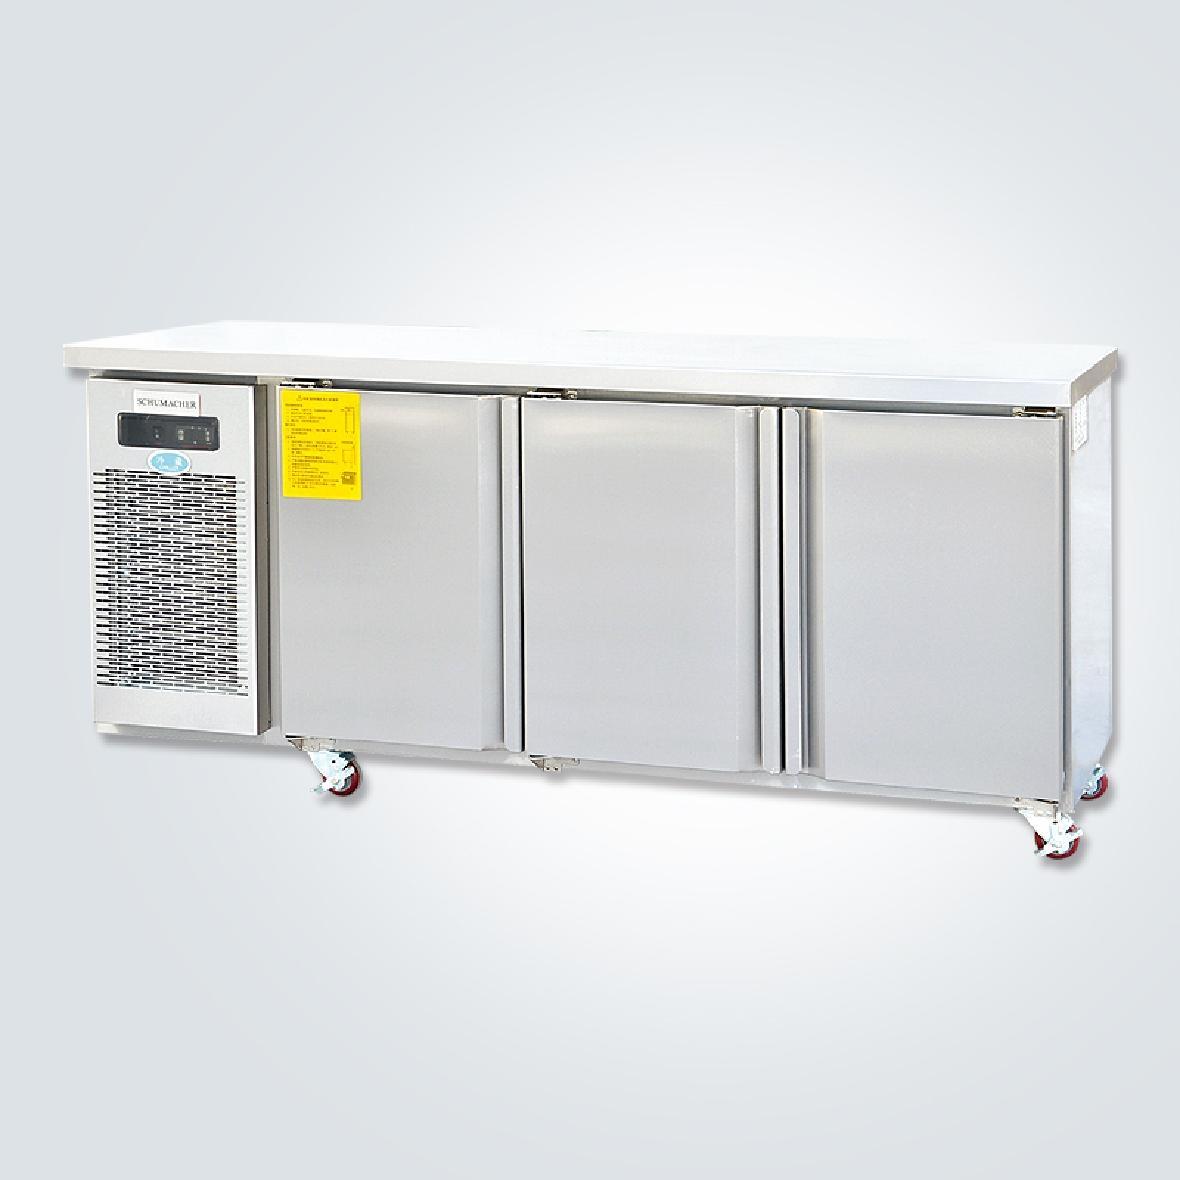 SCT-6W3 風冷工作台三門網架式